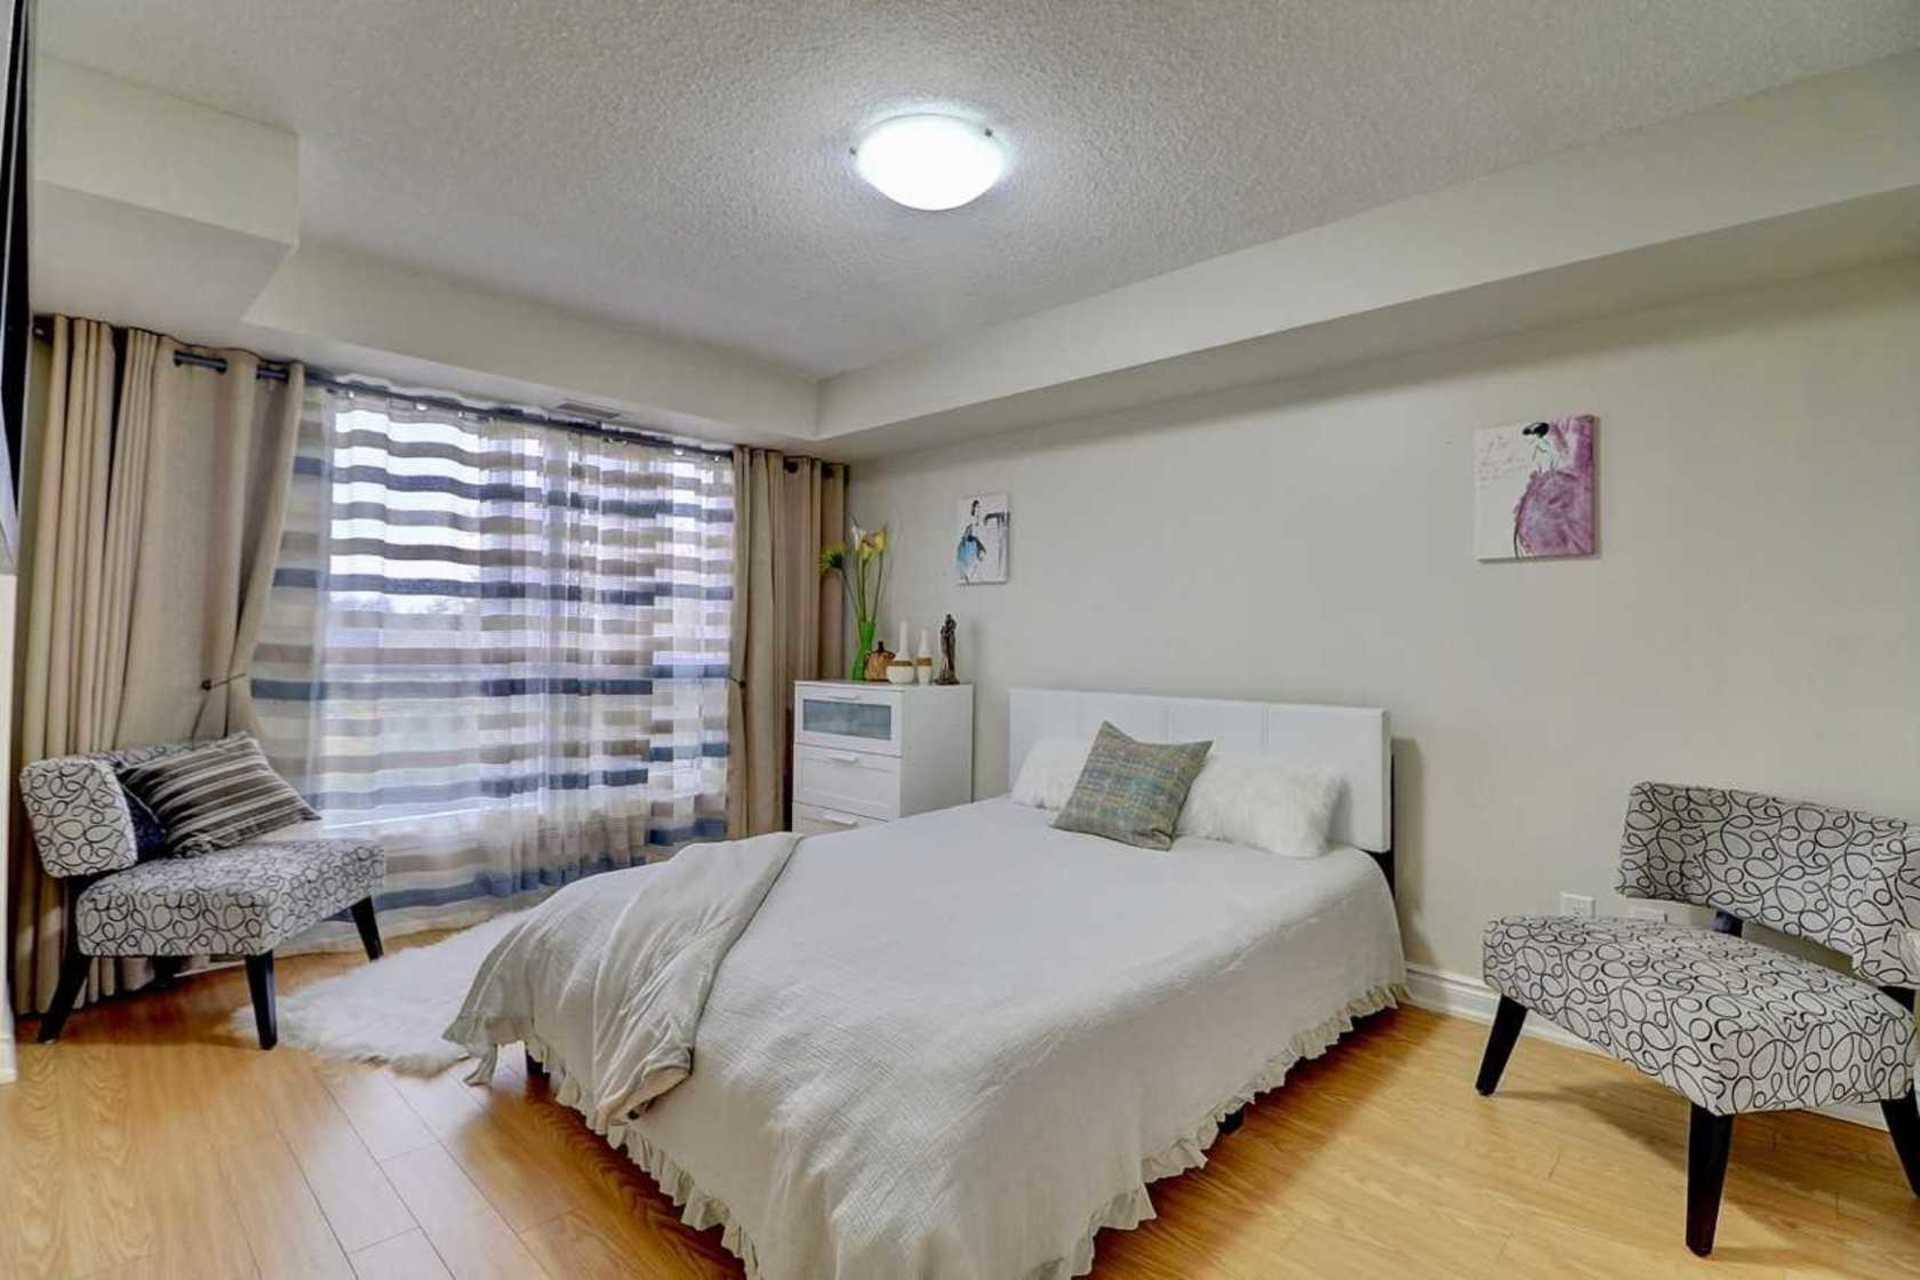 Master Bedroom at 401 - 760 Sheppard Avenue W, Bathurst Manor, Toronto